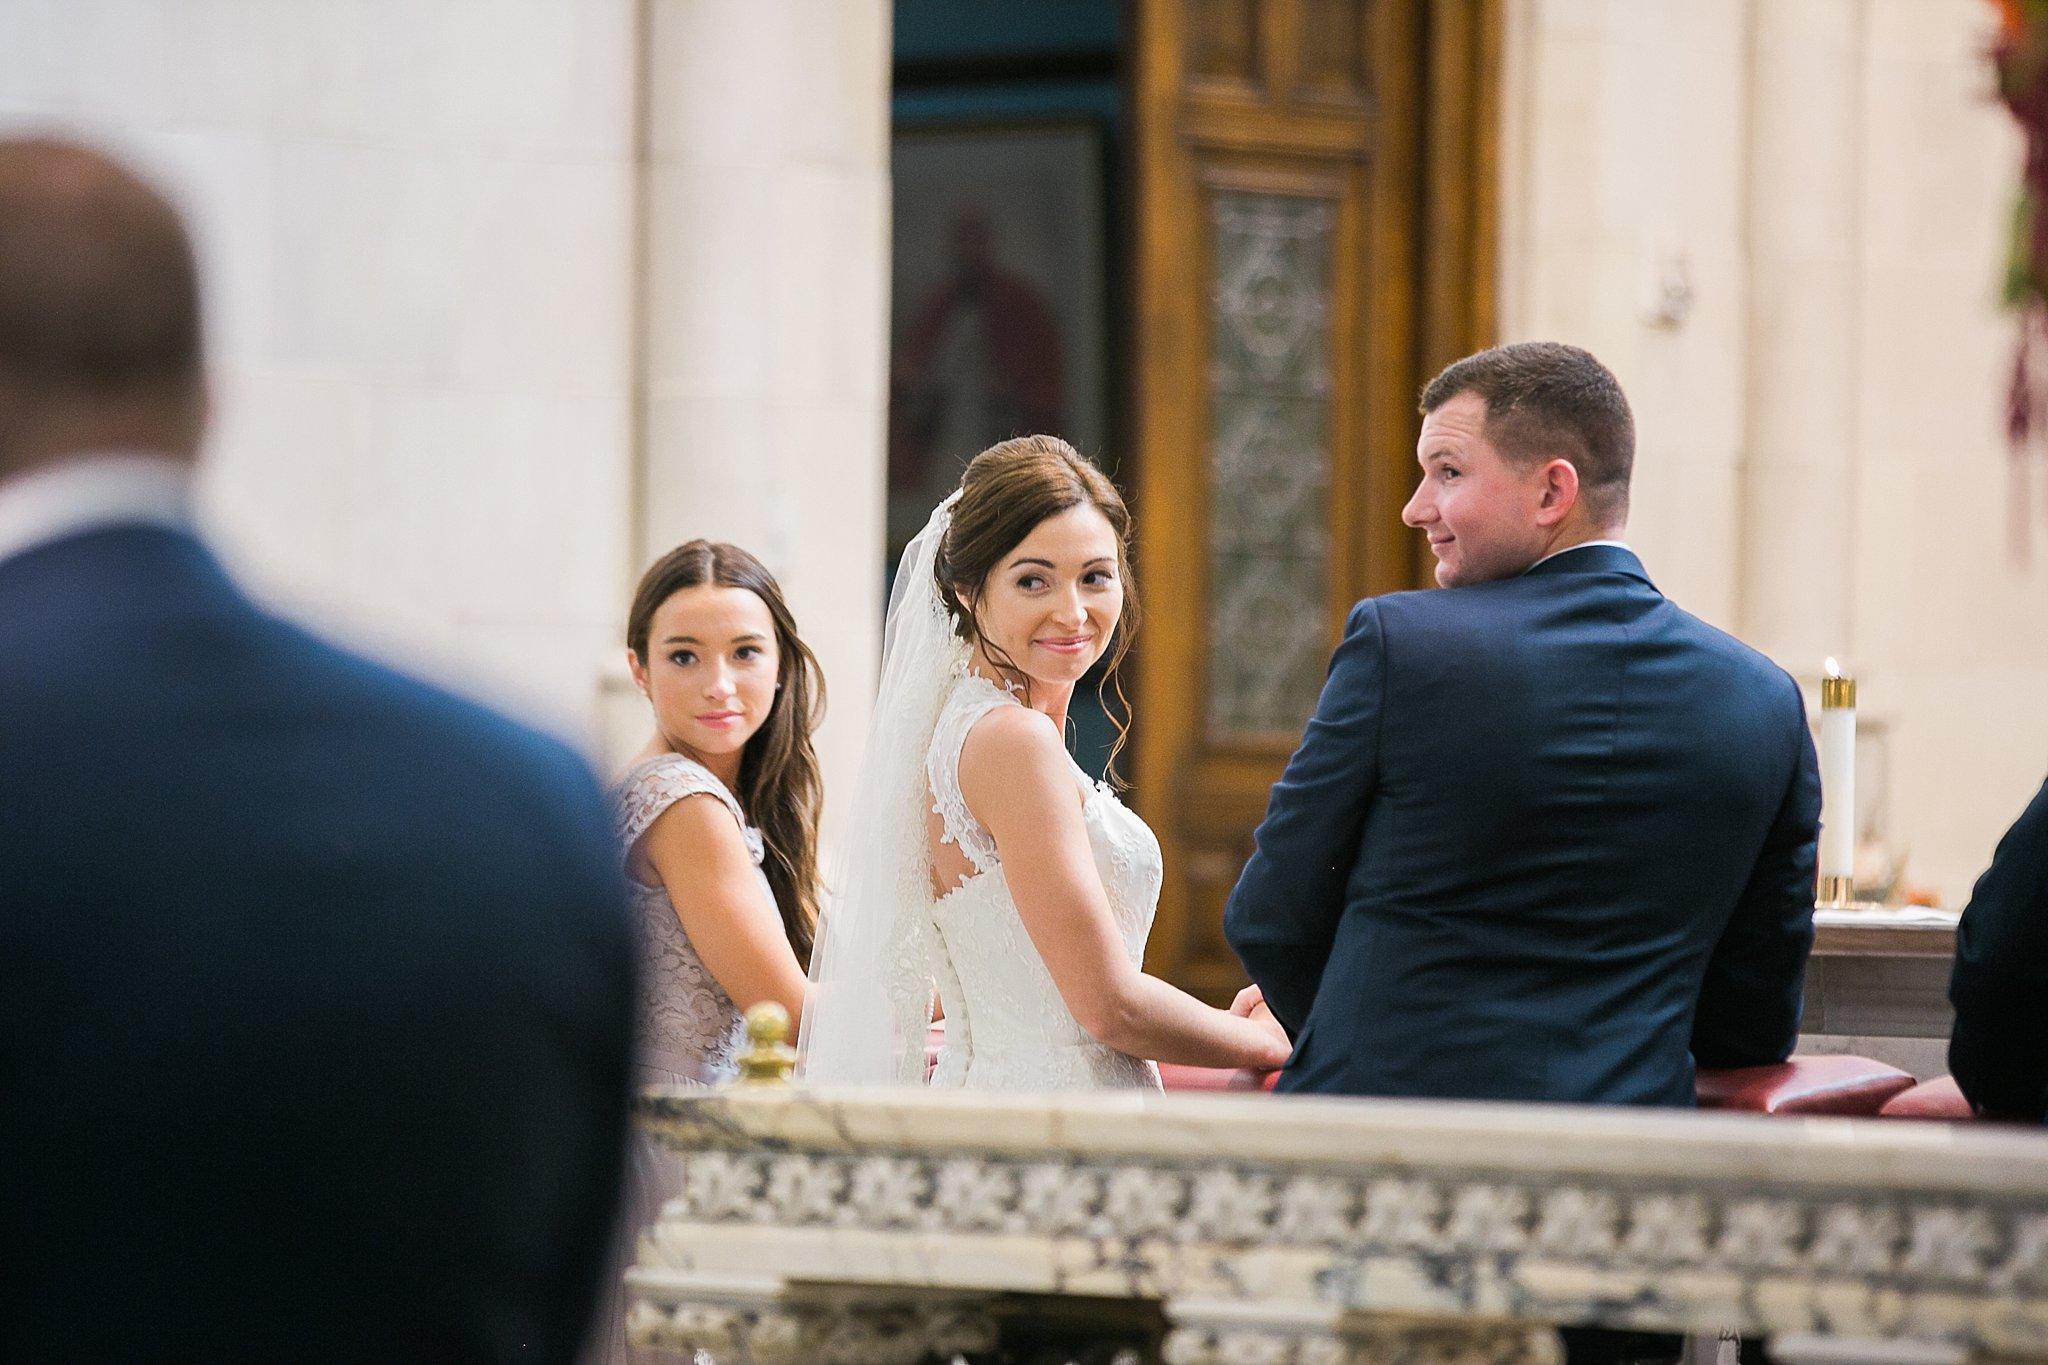 Seaport Hotel Wedding Boston Photographer Sweet Alice30.jpg